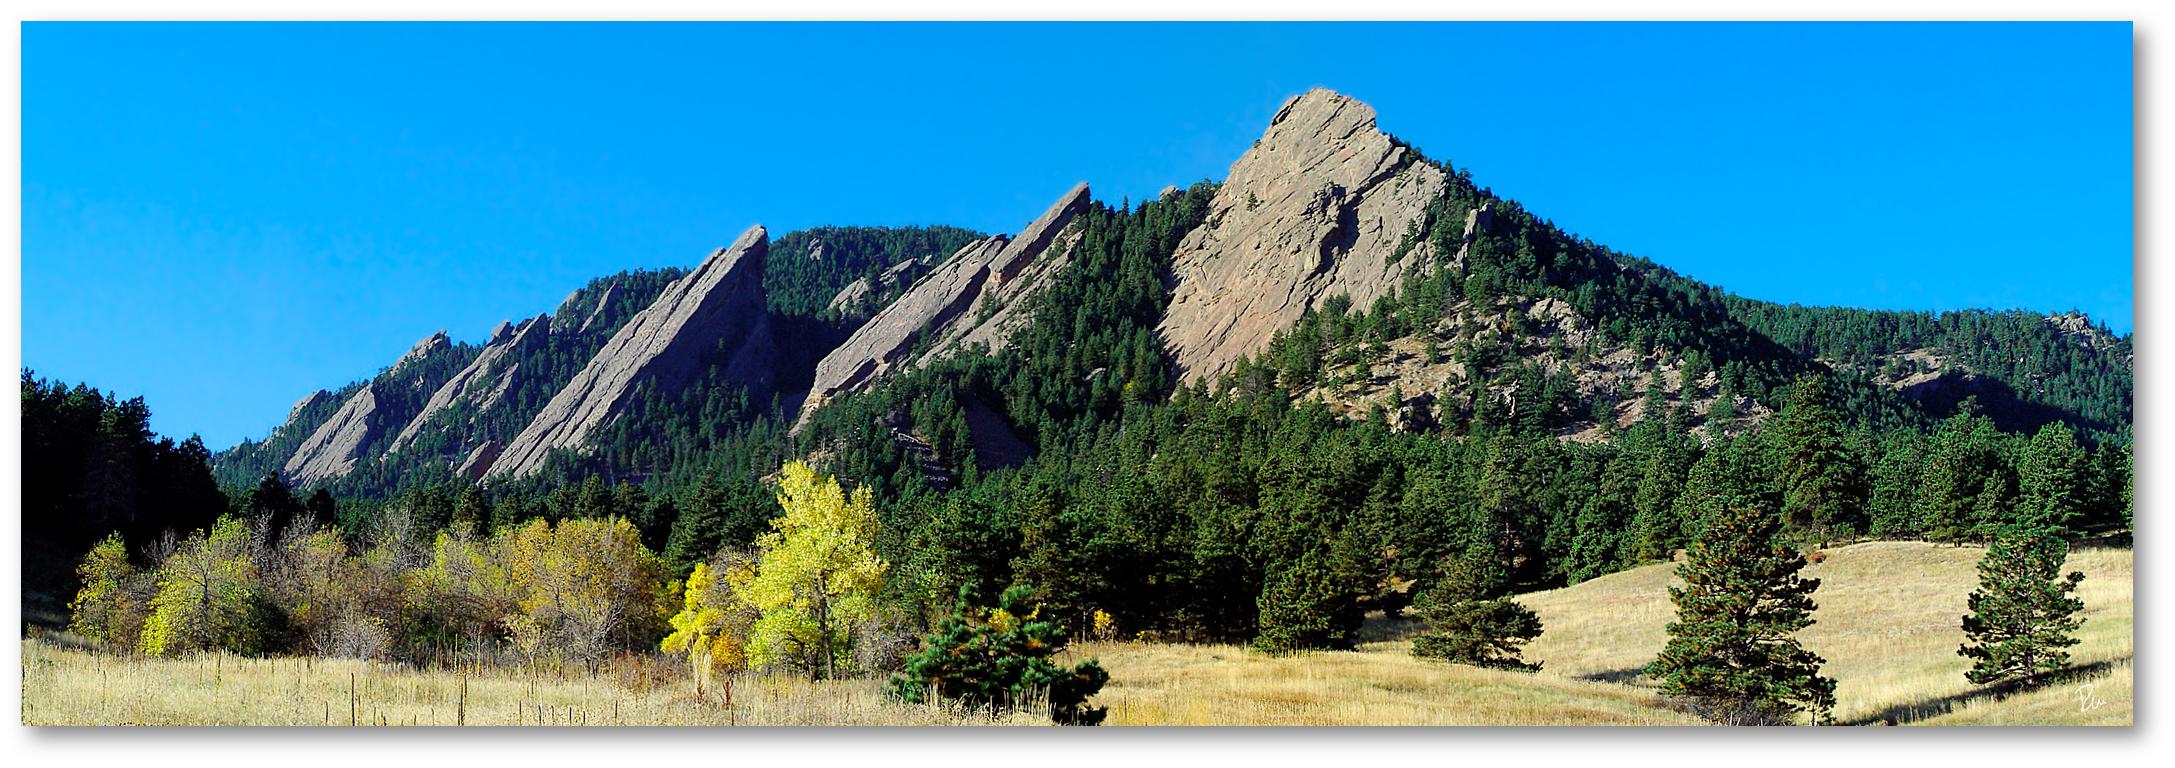 Boulder Photographer Rich Wolf